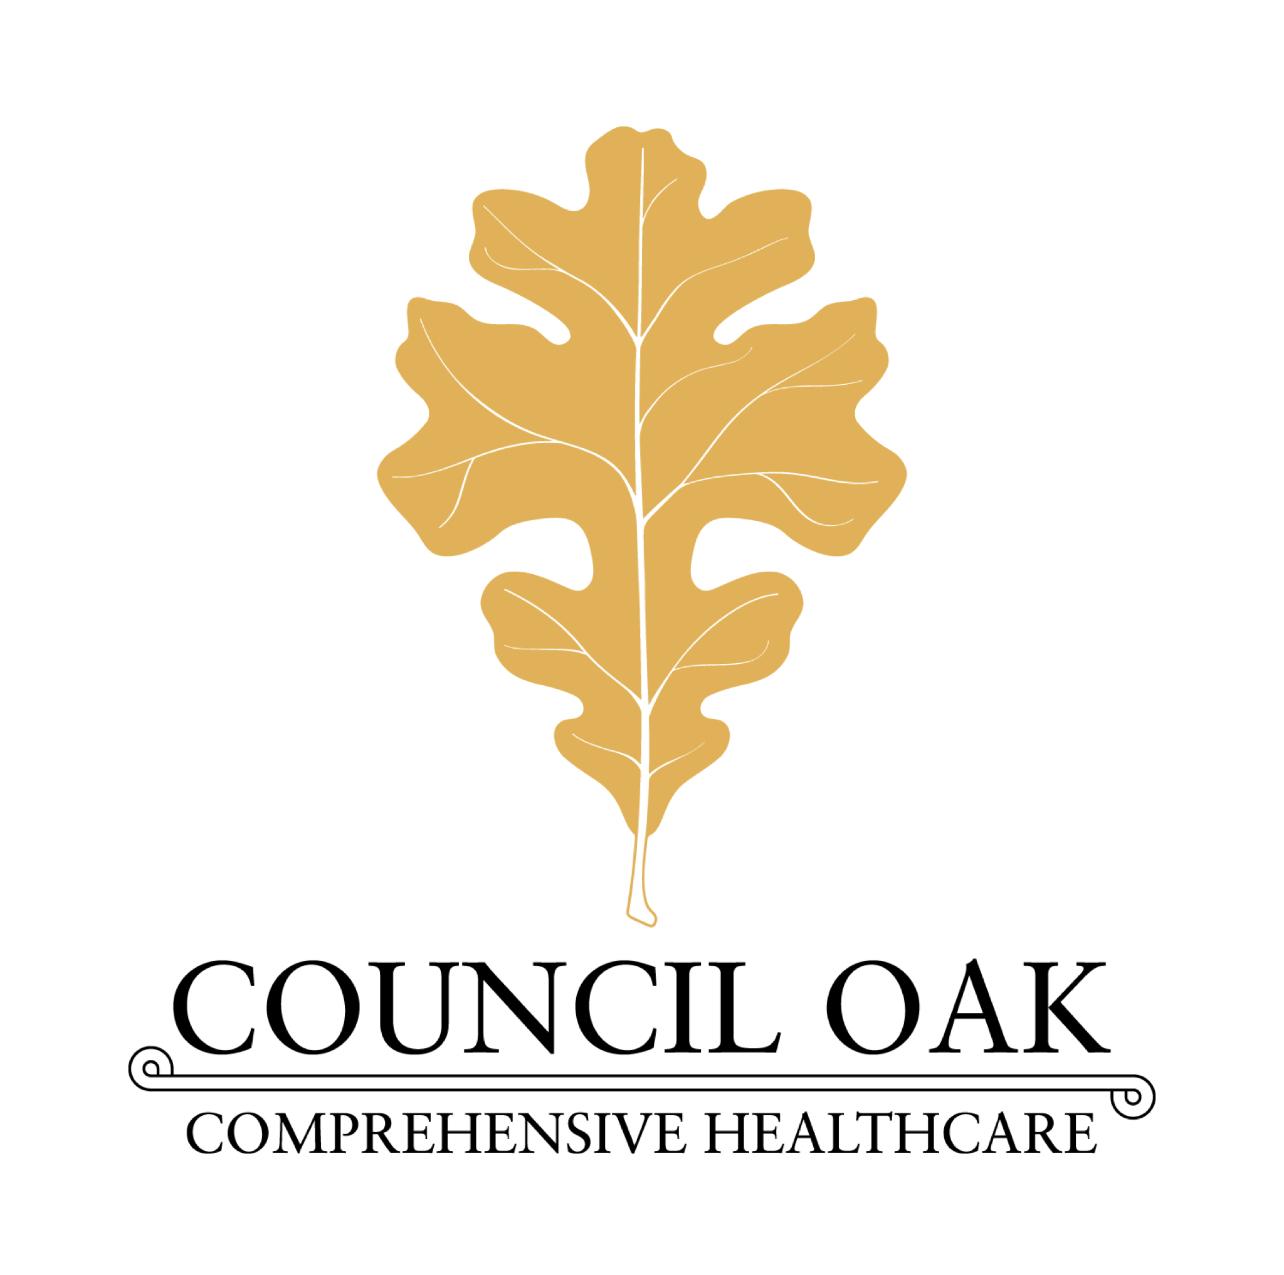 Council Oak Comprehensive Healthcare